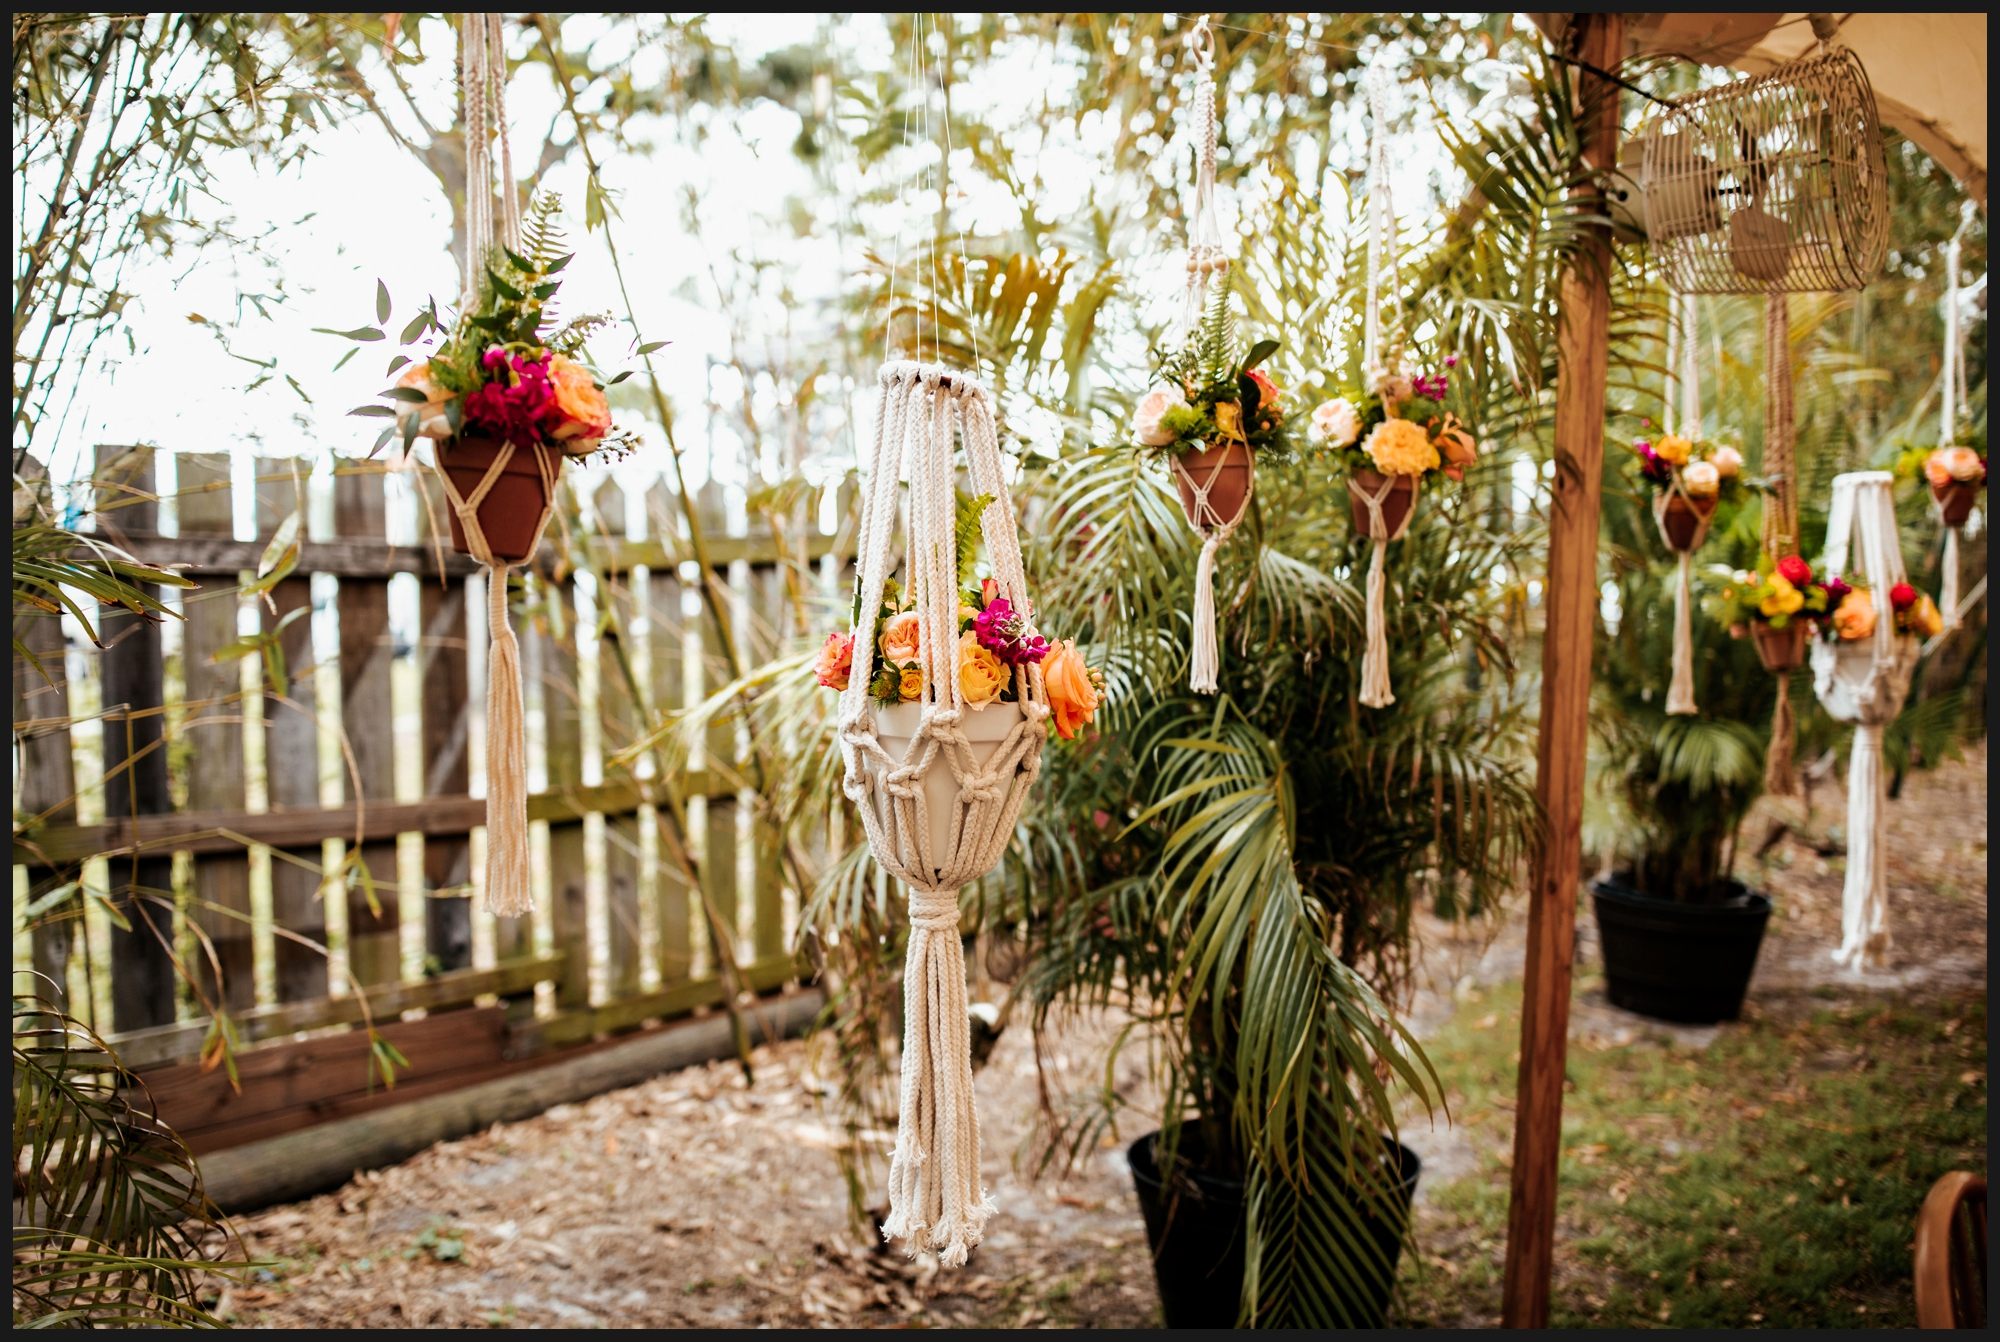 Orlando-Wedding-Photographer-destination-wedding-photographer-florida-wedding-photographer-bohemian-wedding-photographer_2029.jpg